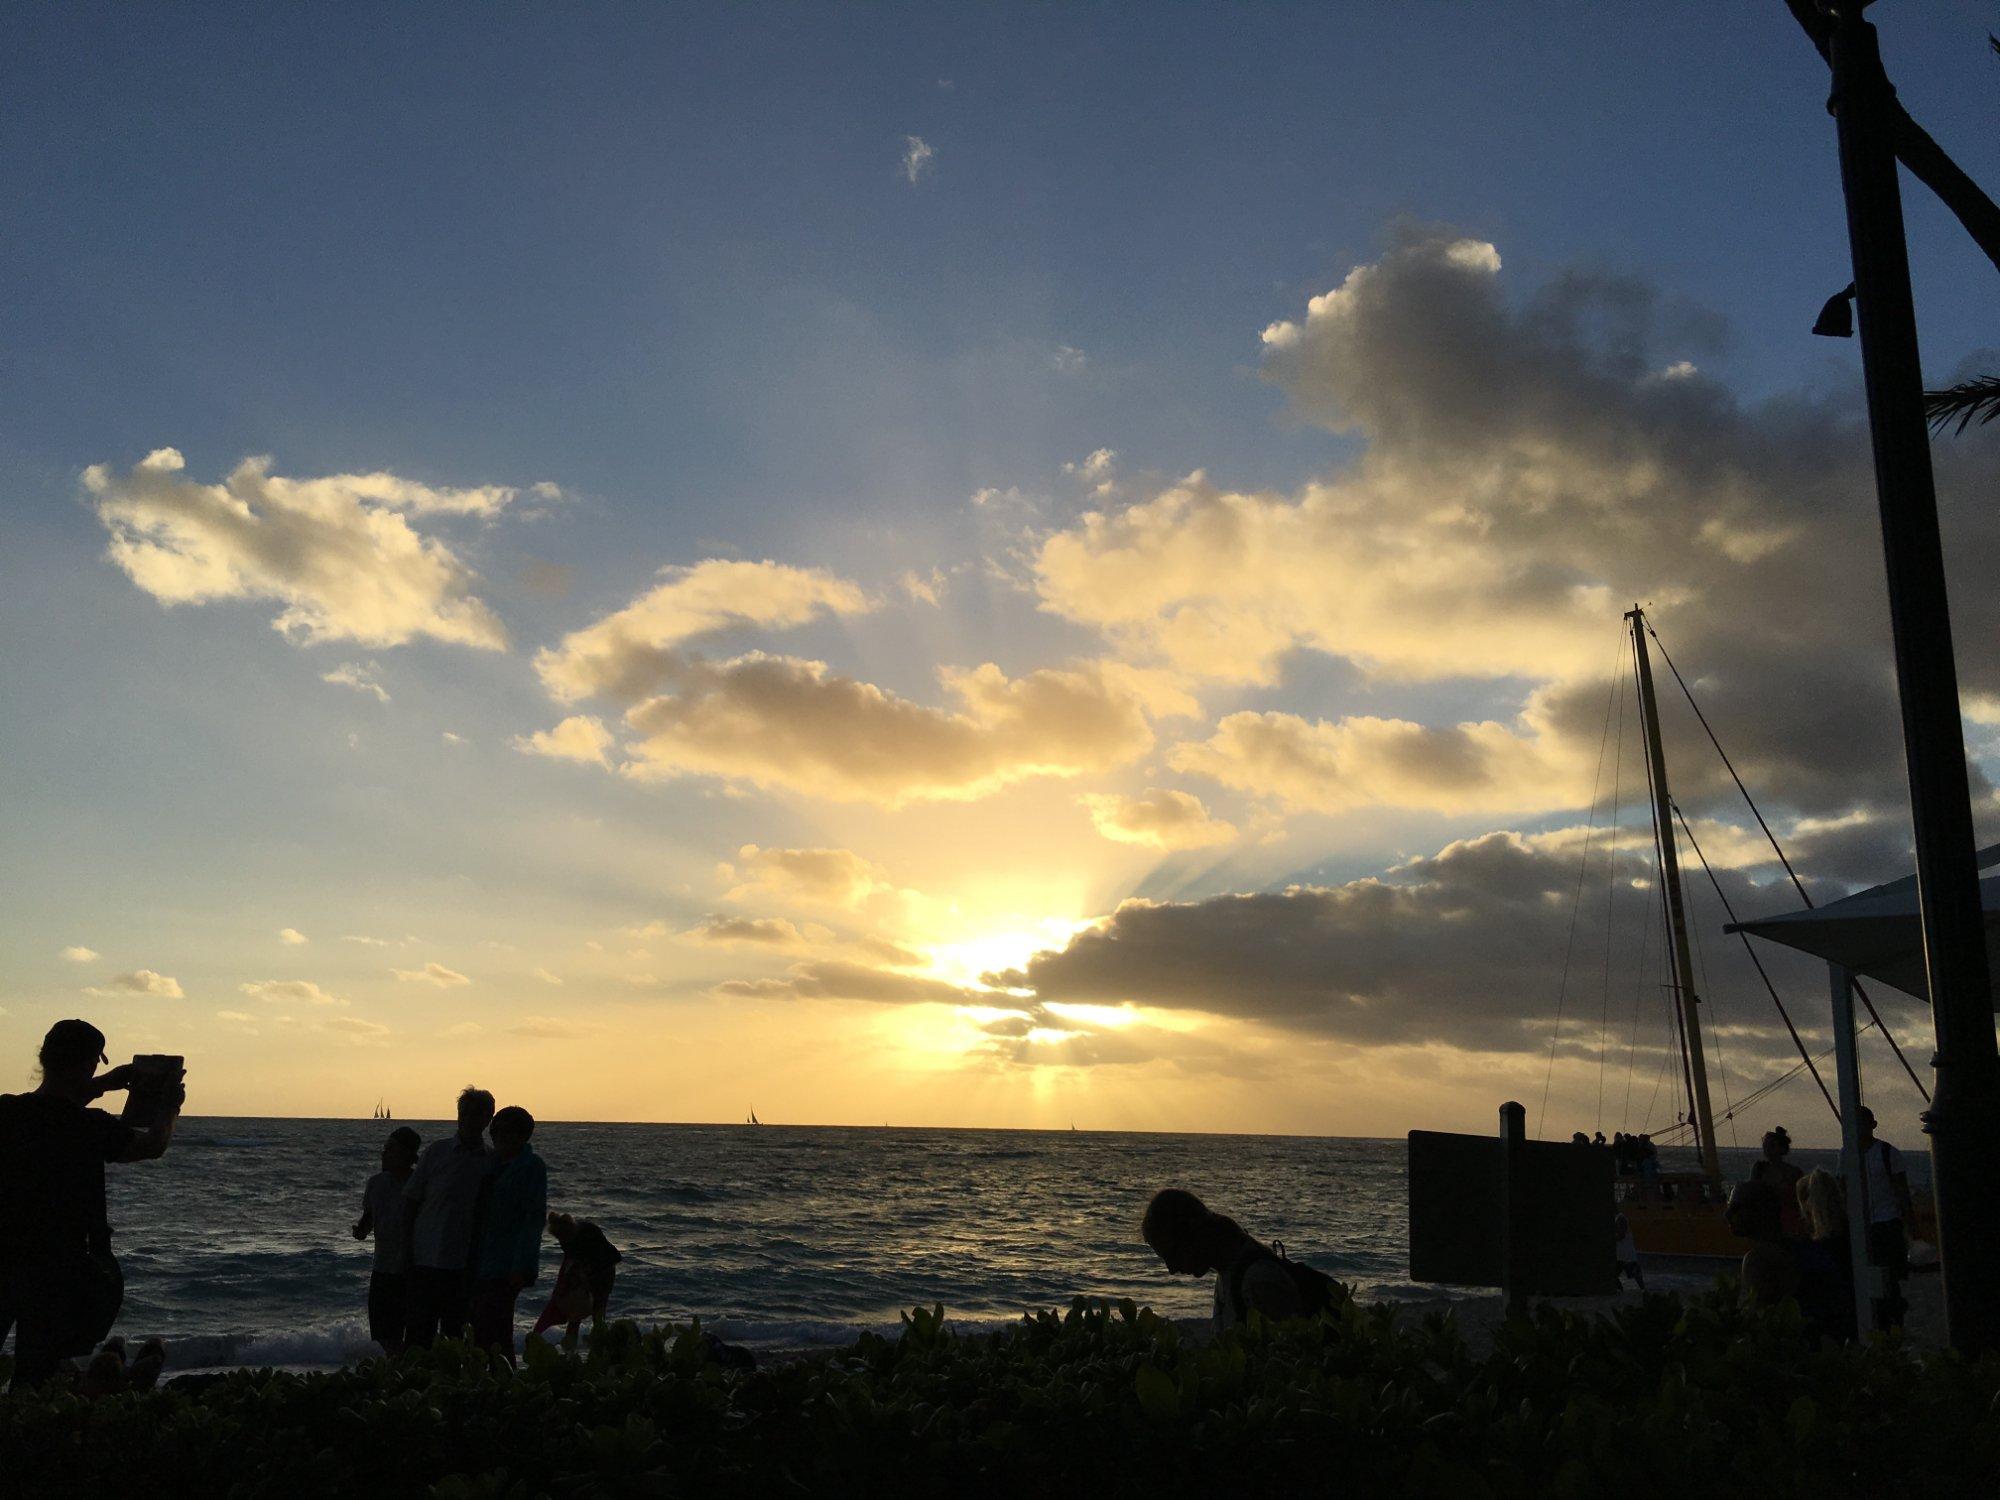 Don't miss Waiki Beach, this photo taken from the Royal Hawaiian Hotel